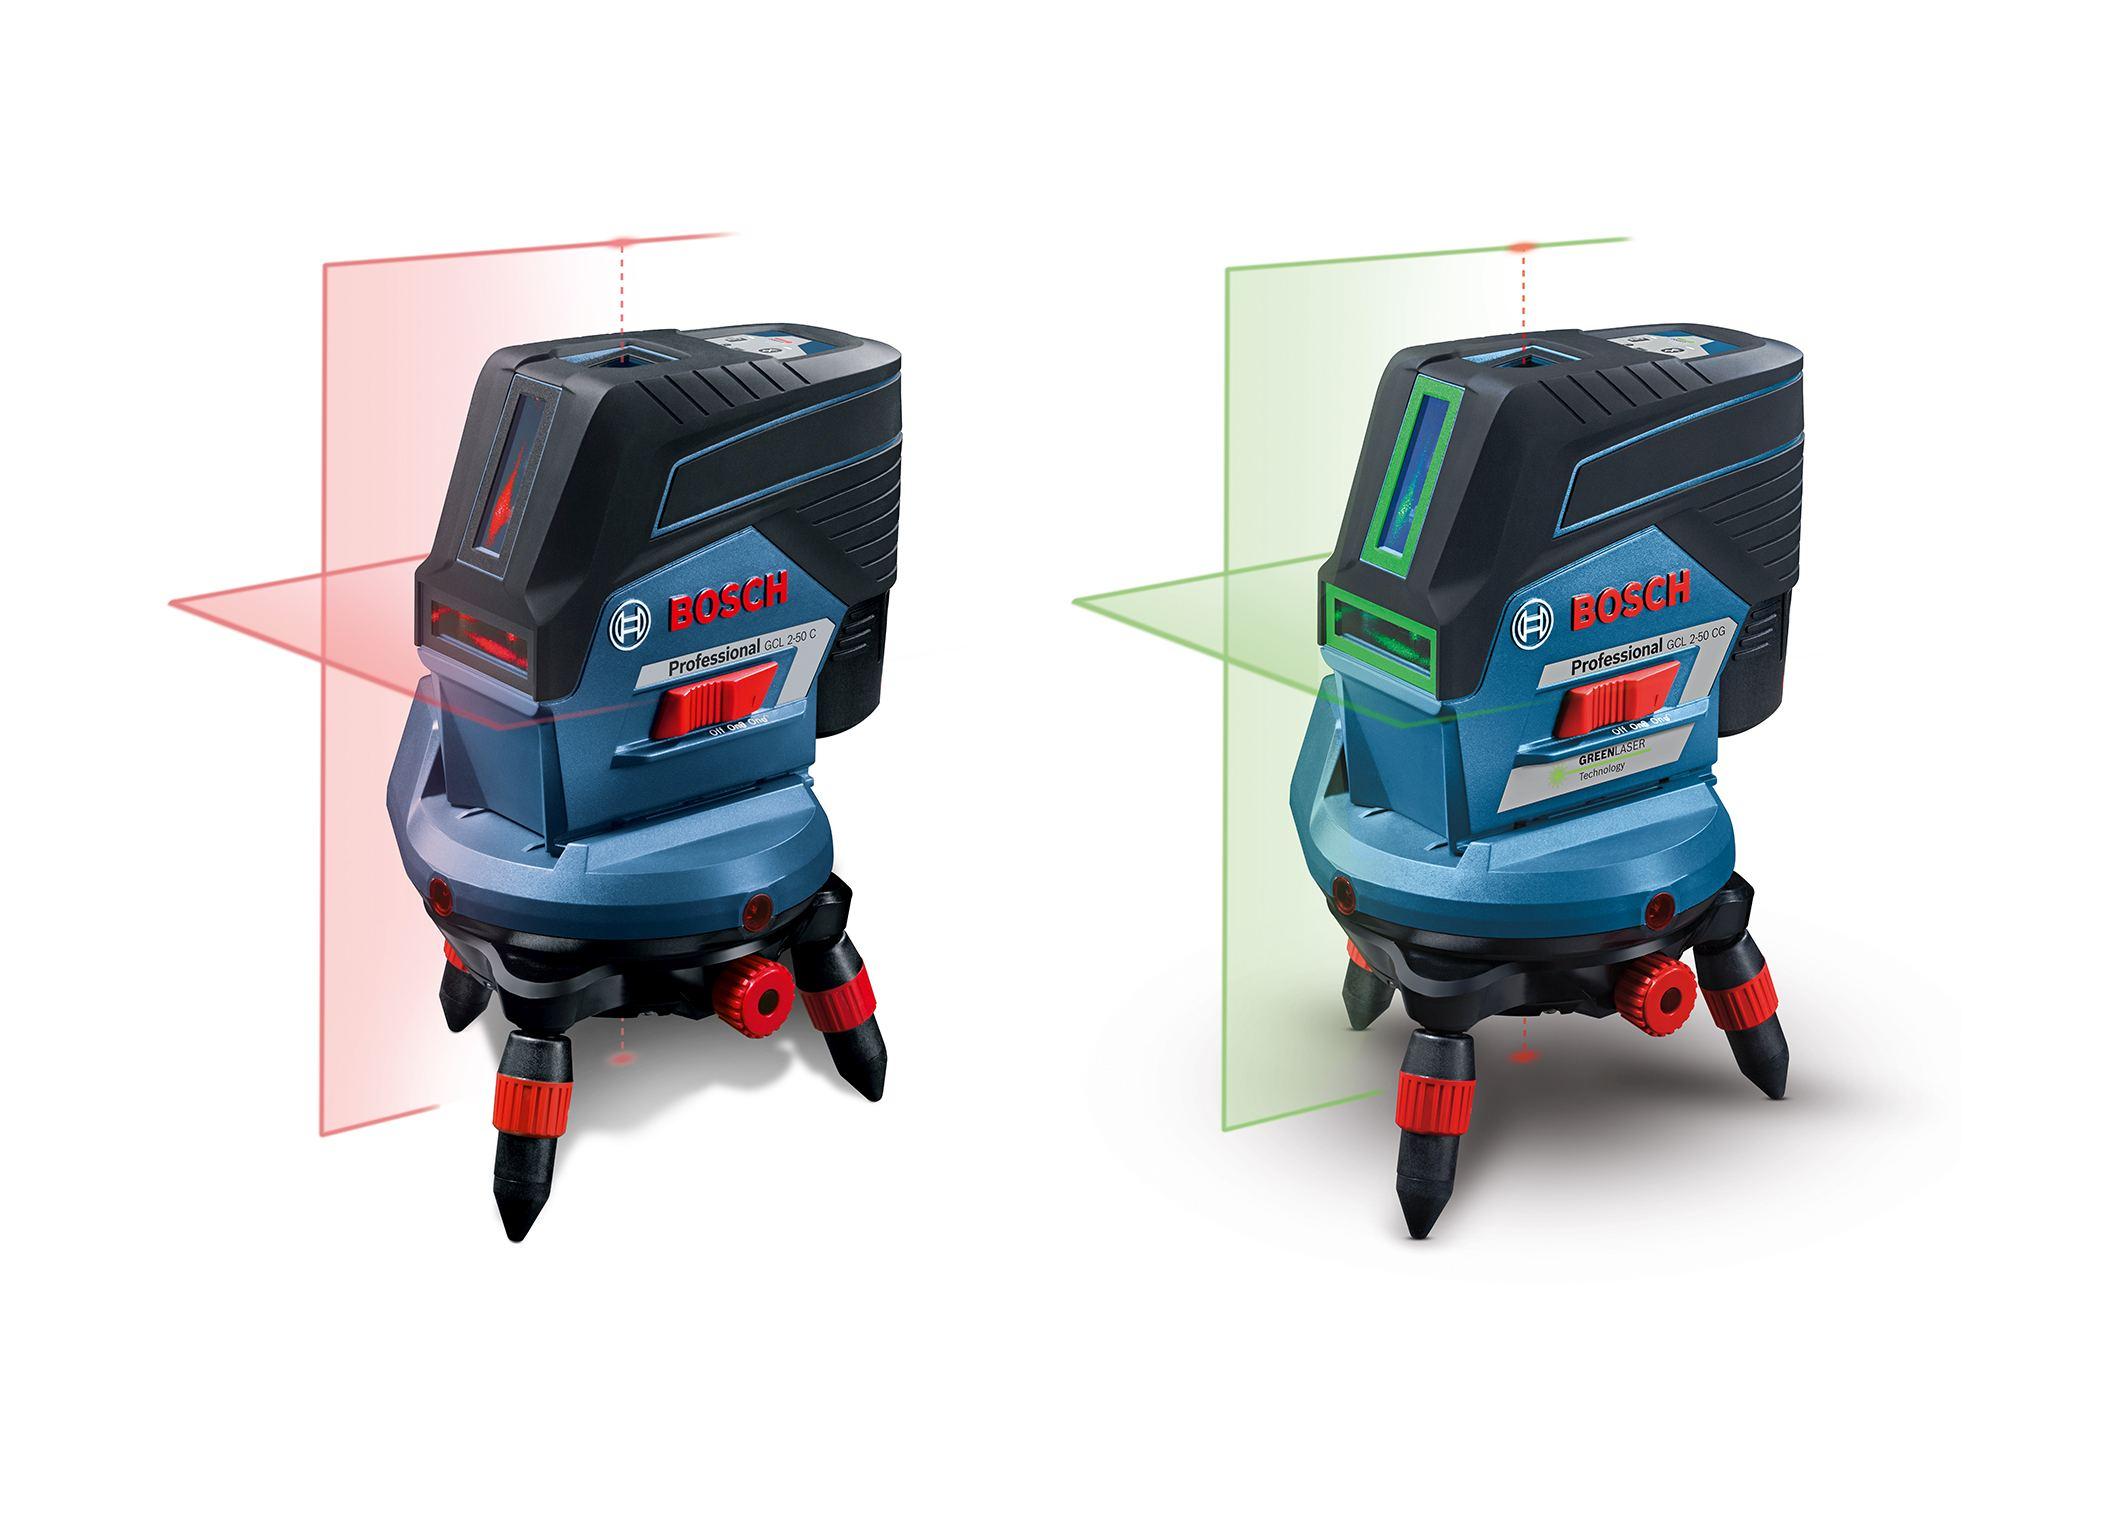 Laser entfernungsmesser ultraschall entfernungsmesser günstig